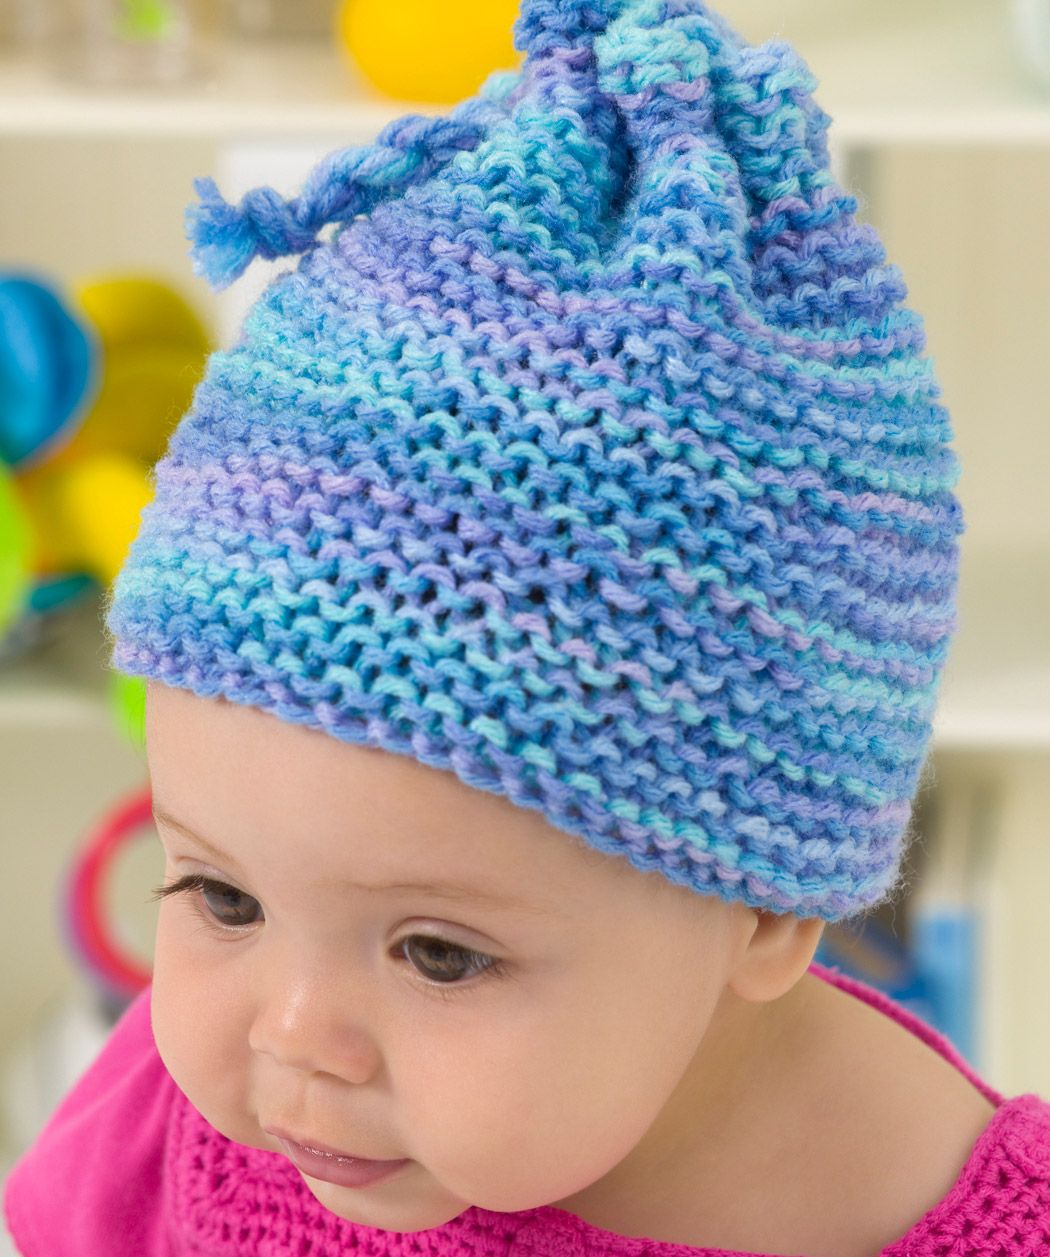 Knit Garter Stitch Baby Hat Knitting Pattern  5d1a73dd1d8